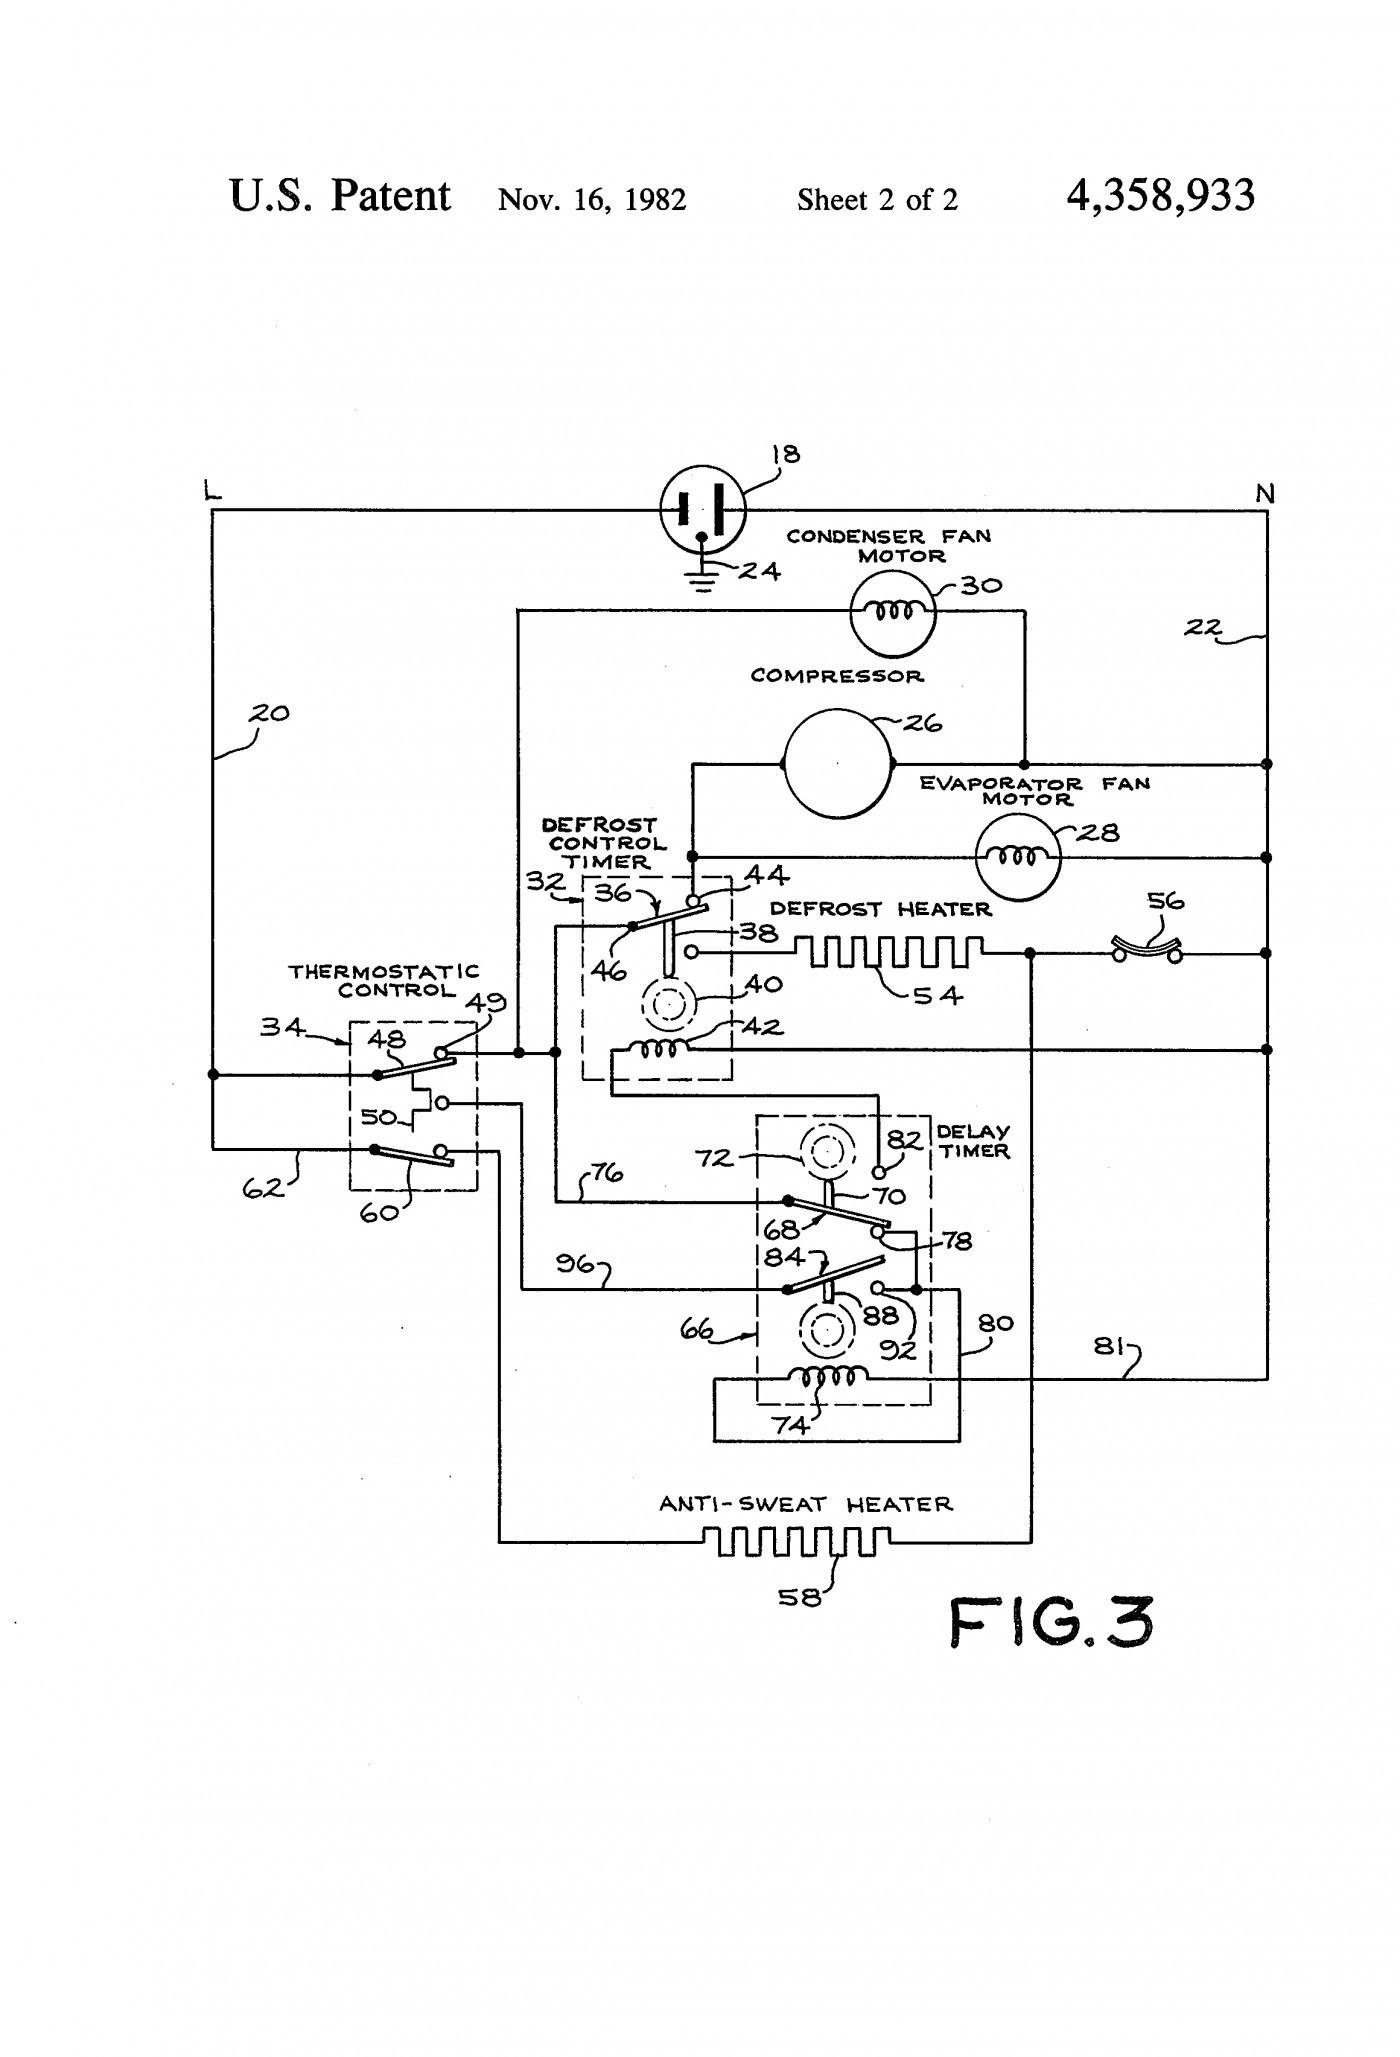 hight resolution of bohn evaporator wiring diagram wiring diagrams lolbohn freezer wiring diagrams wiring diagram g9 refrigeration control wiring